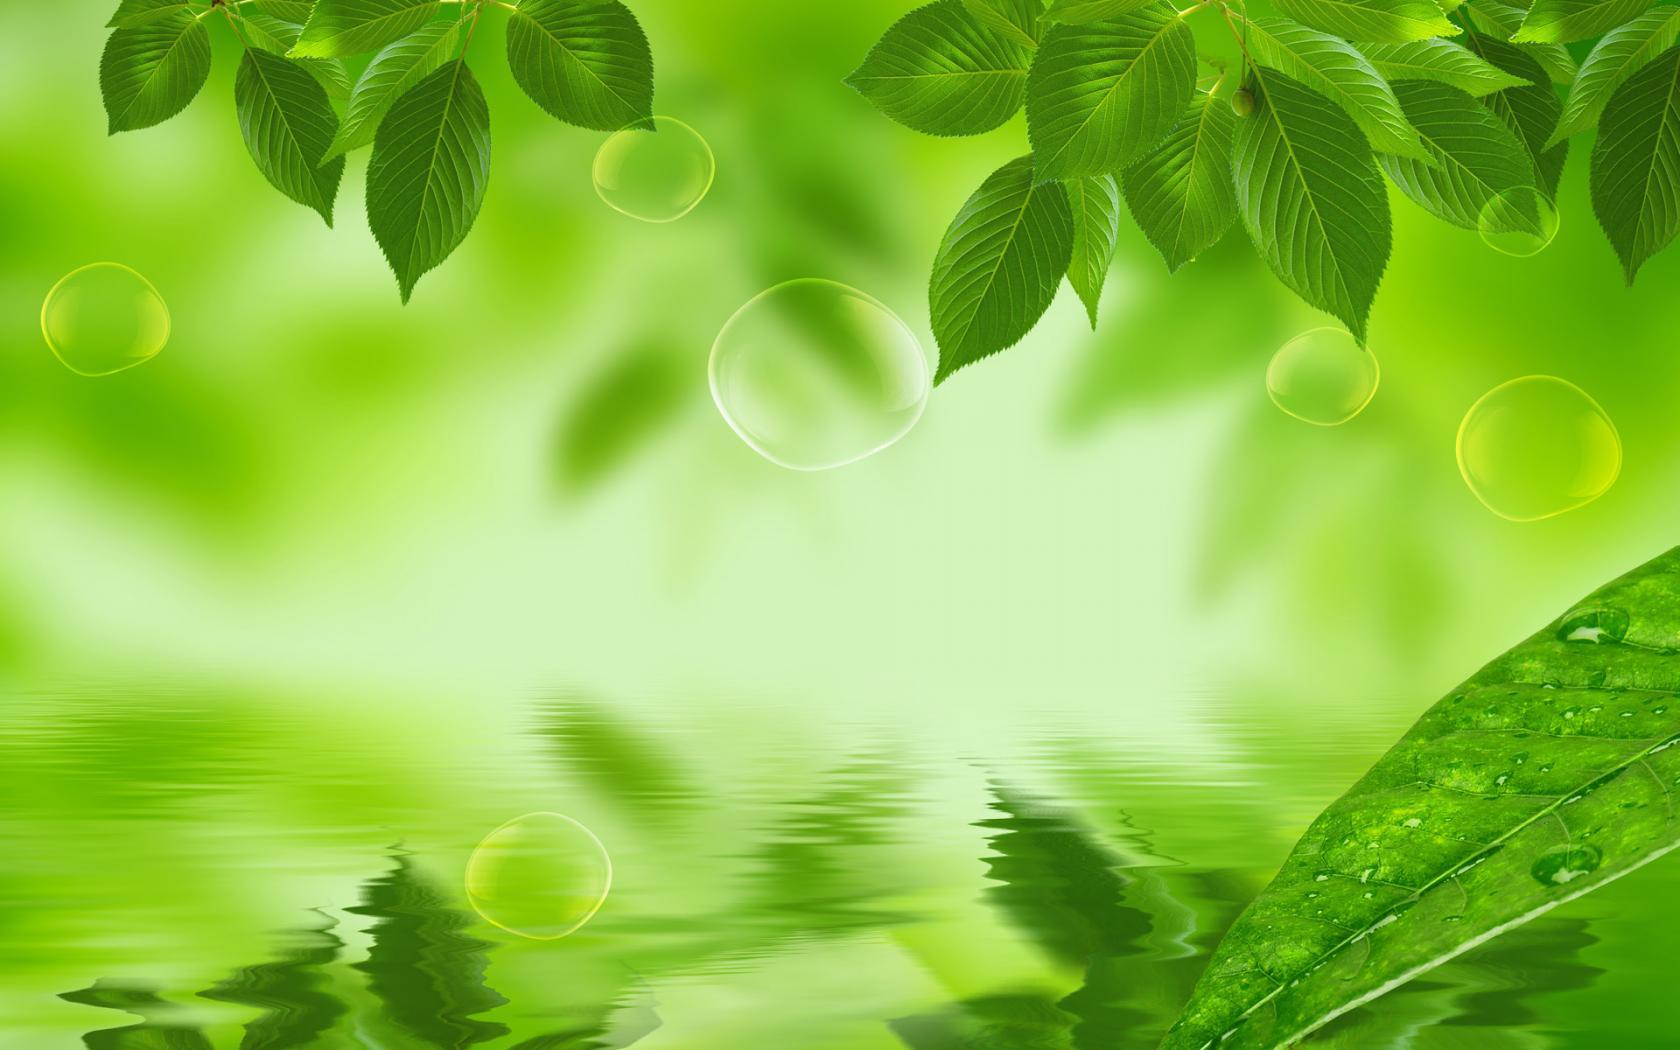 Charming-Green-Nature-Desktop-Backgrounds